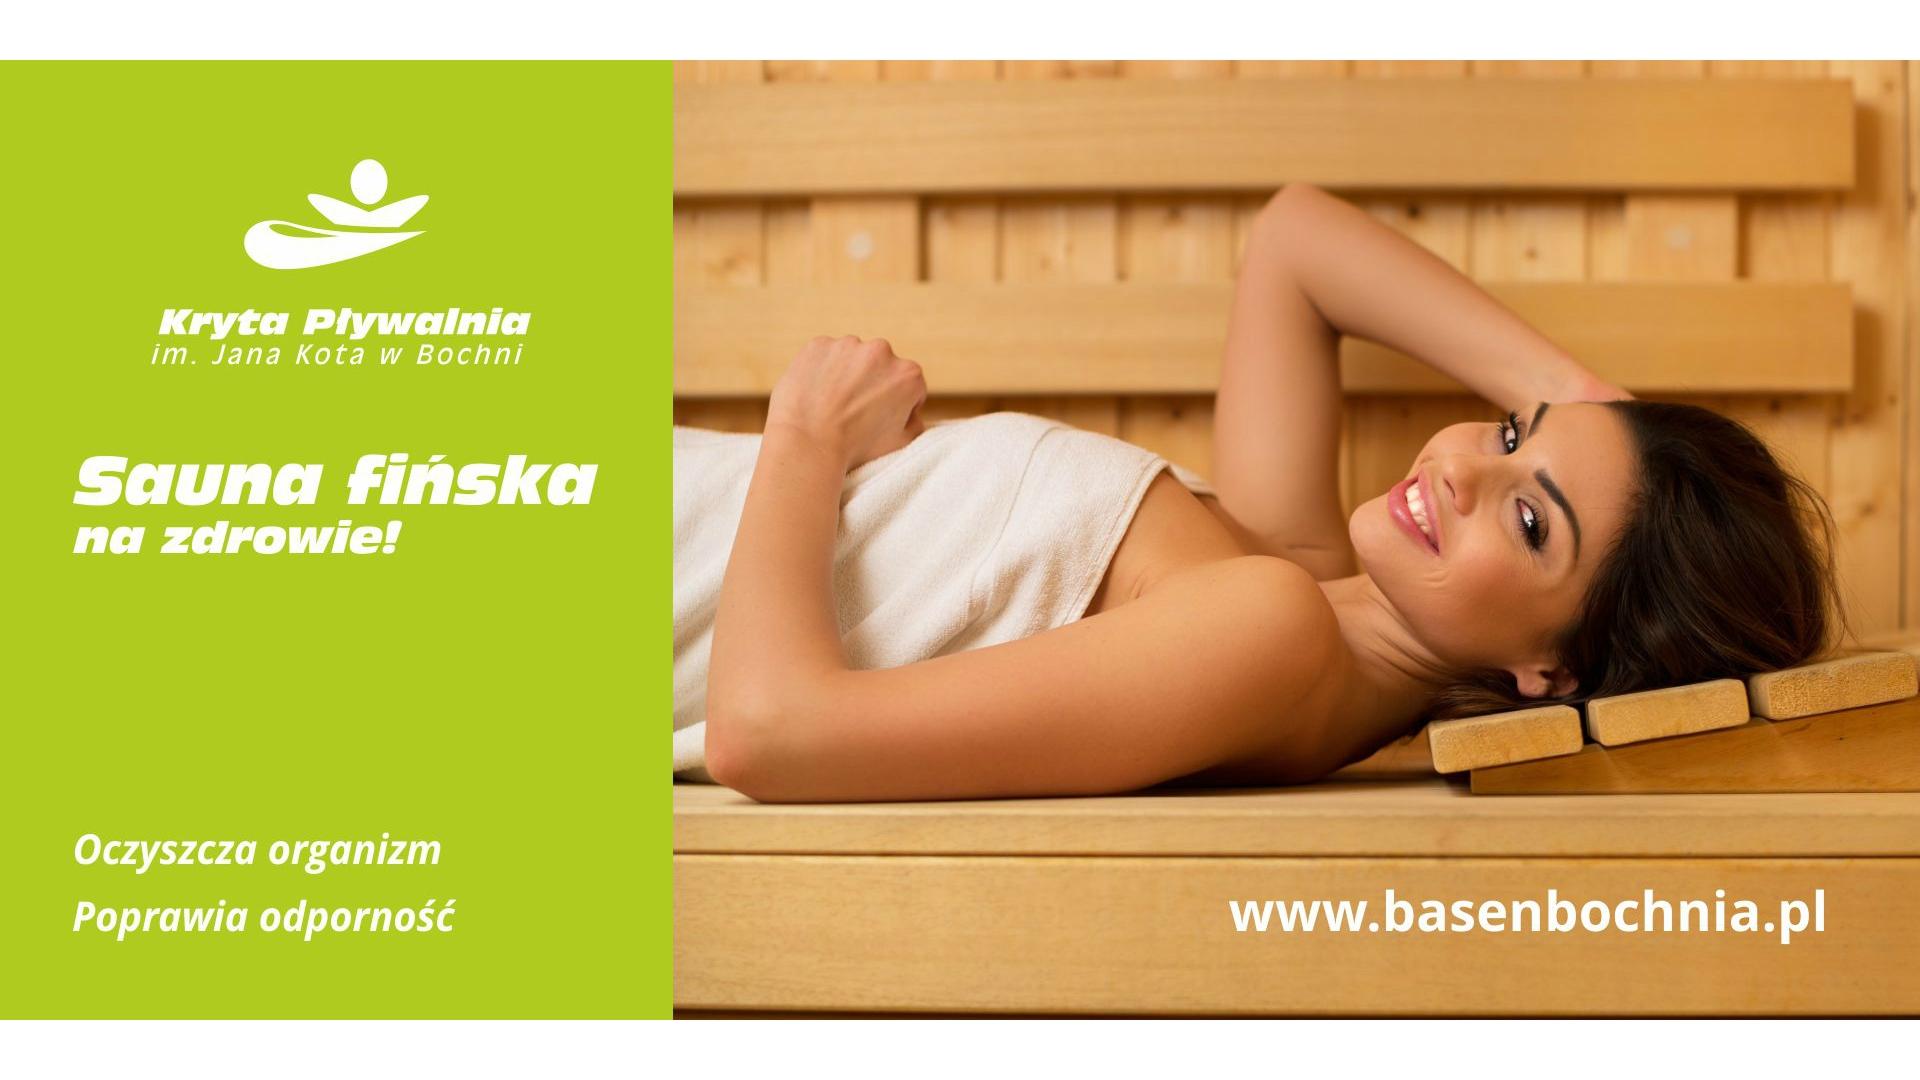 Sauna fińska czynna pn-czw 19-21, a pt, sb, nd 17-21